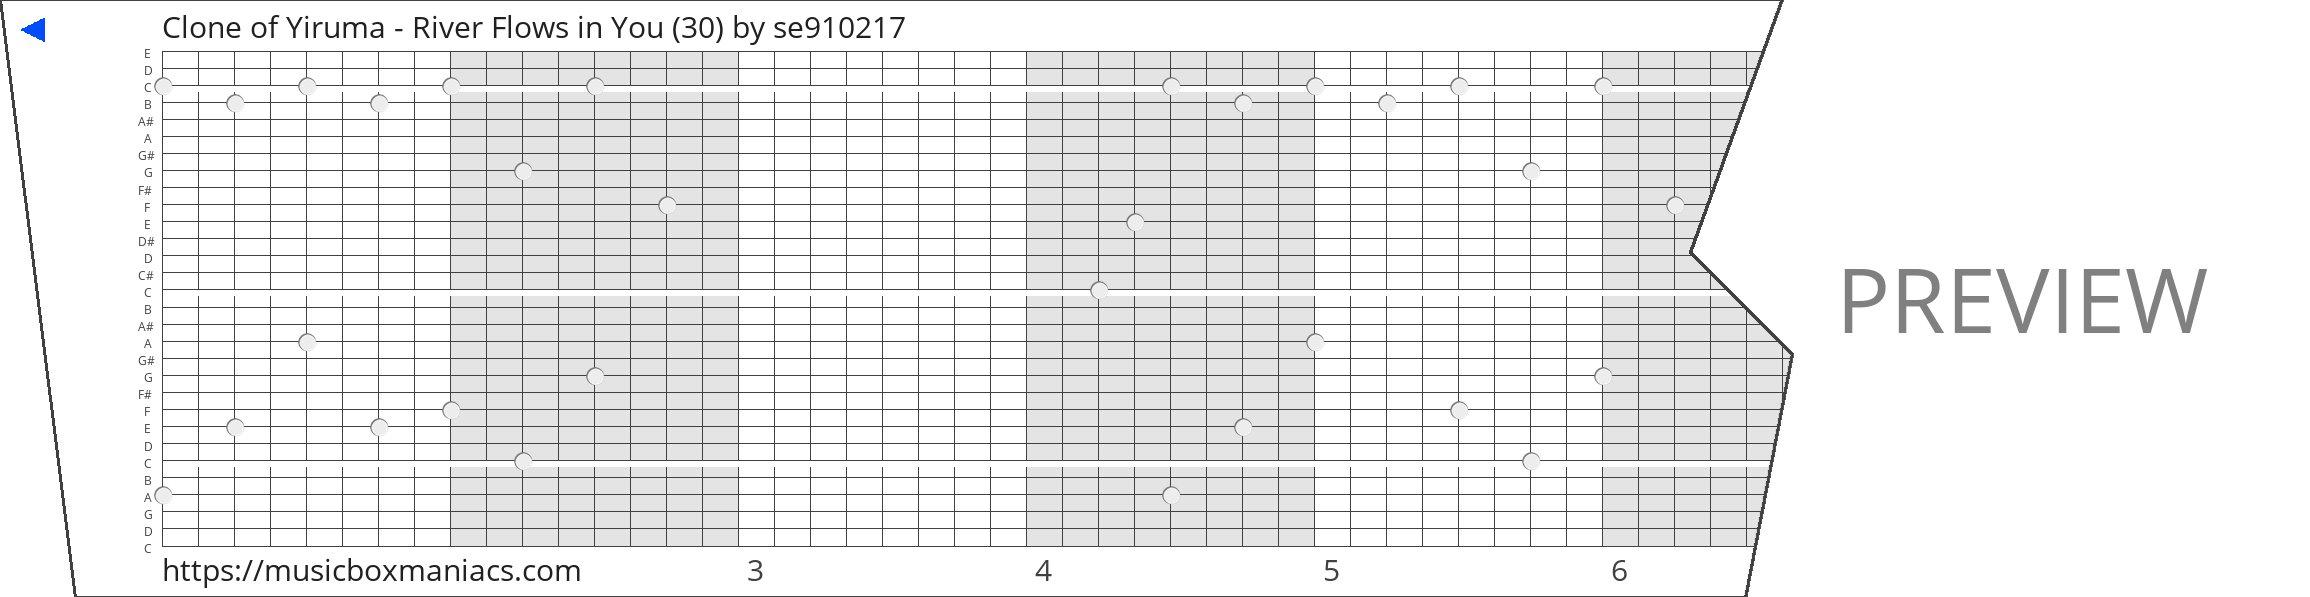 Clone of Yiruma - River Flows in You (30) 30 note music box paper strip